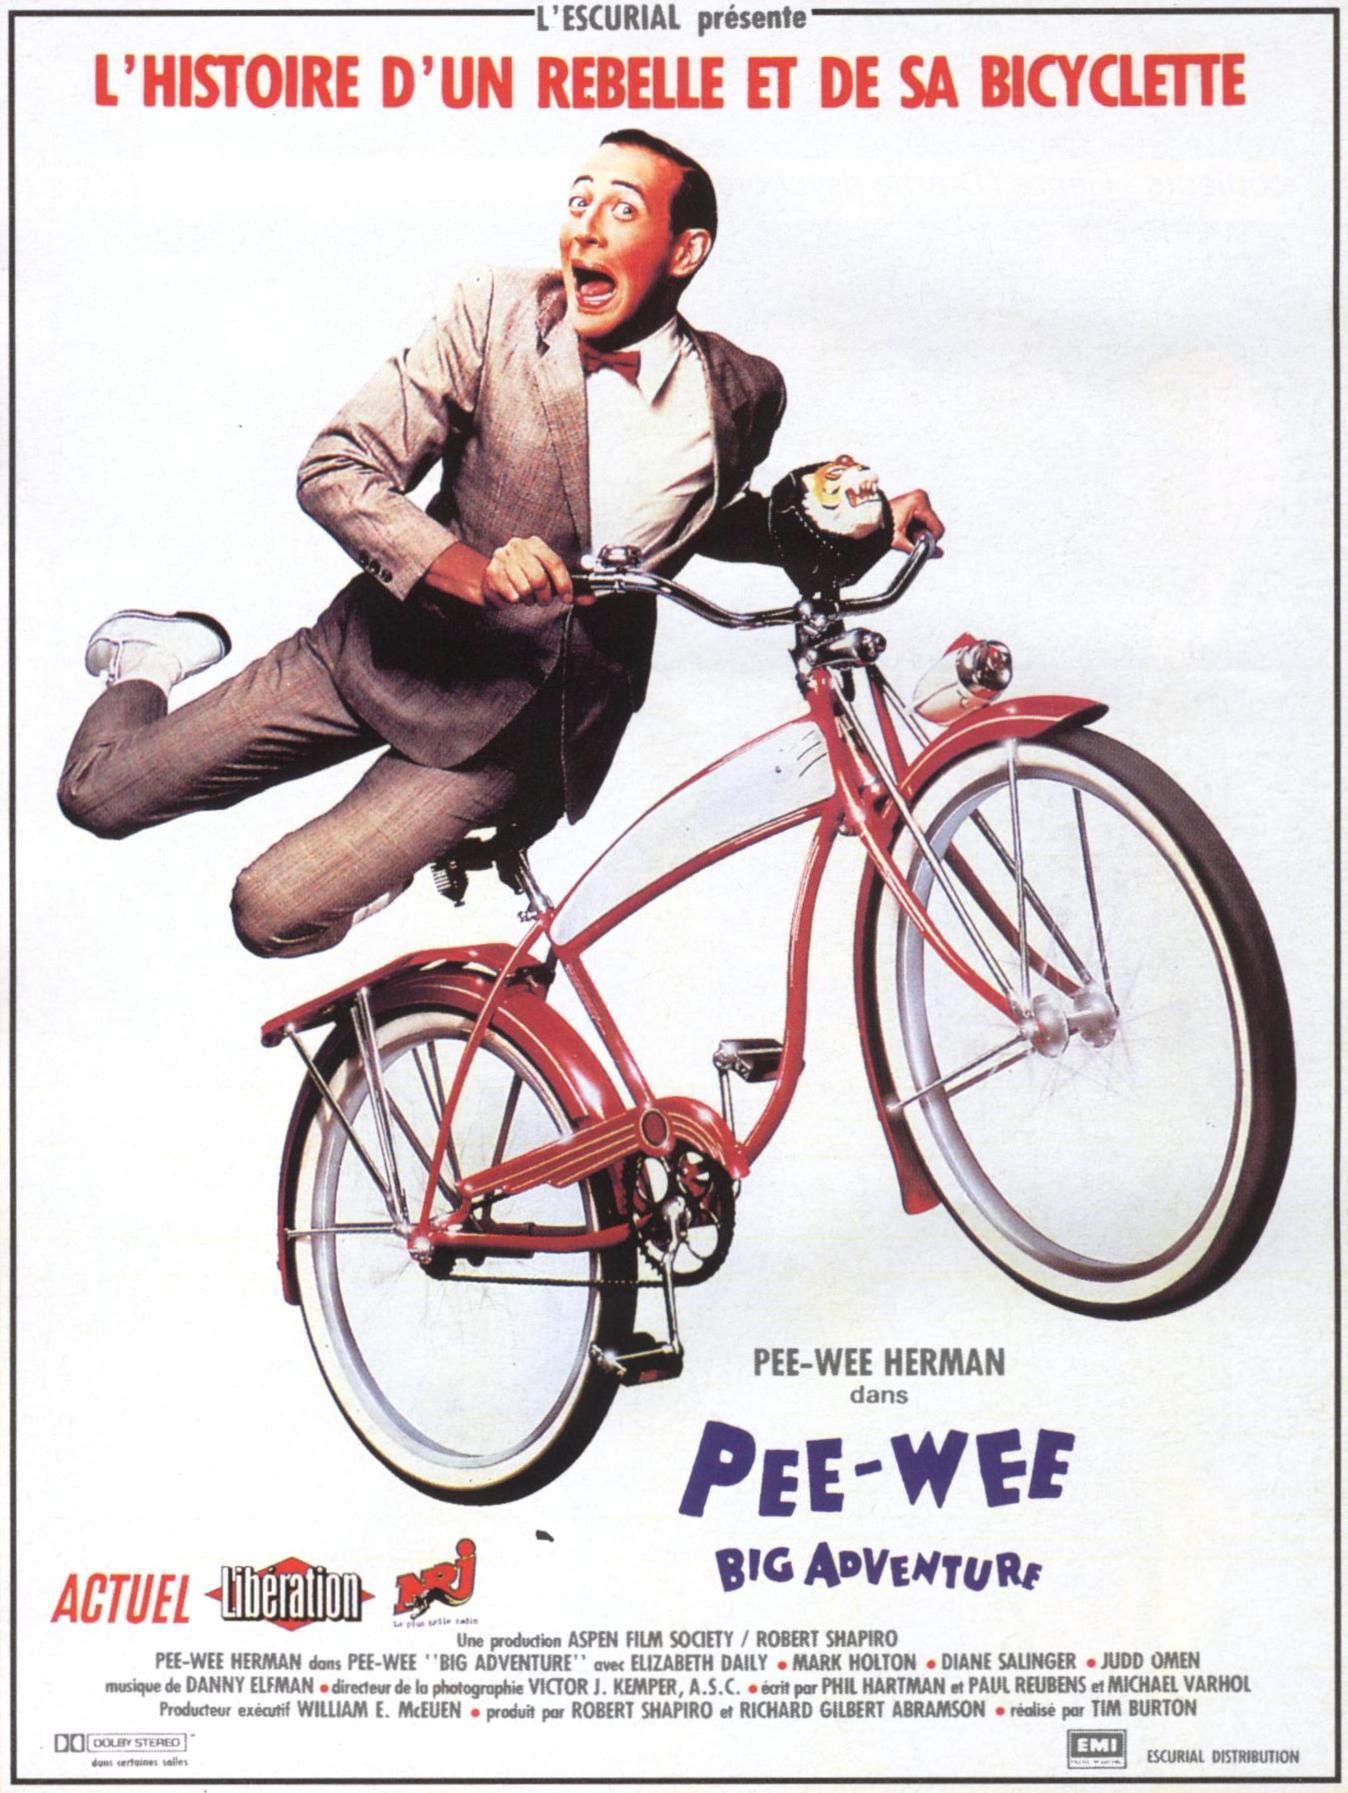 affiche du film Pee-Wee Big Adventure